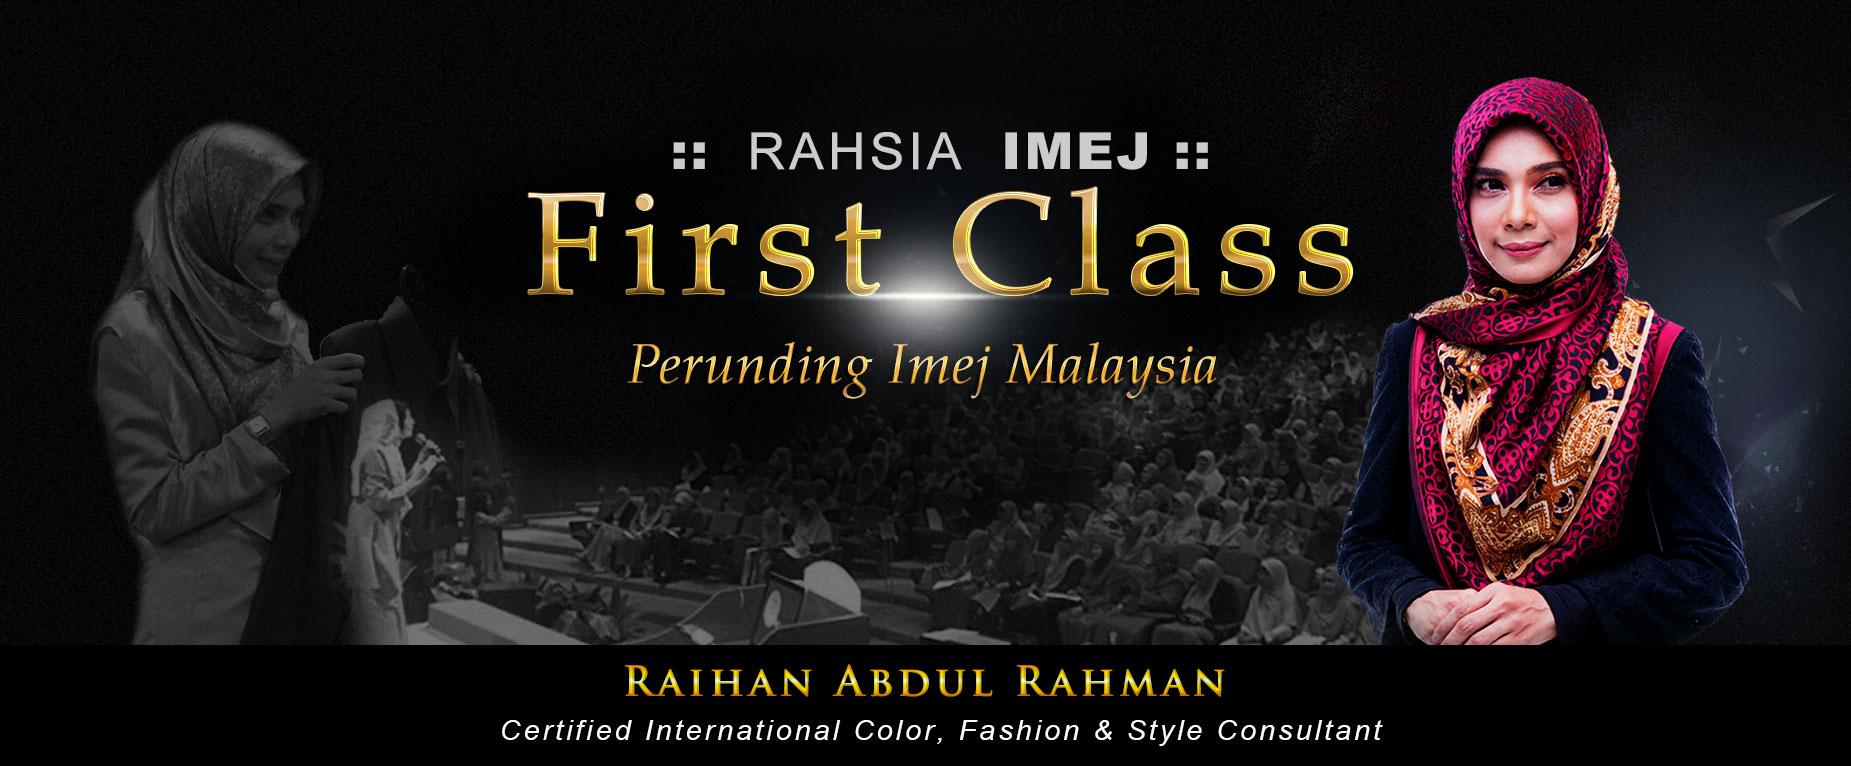 rahsia imej first class